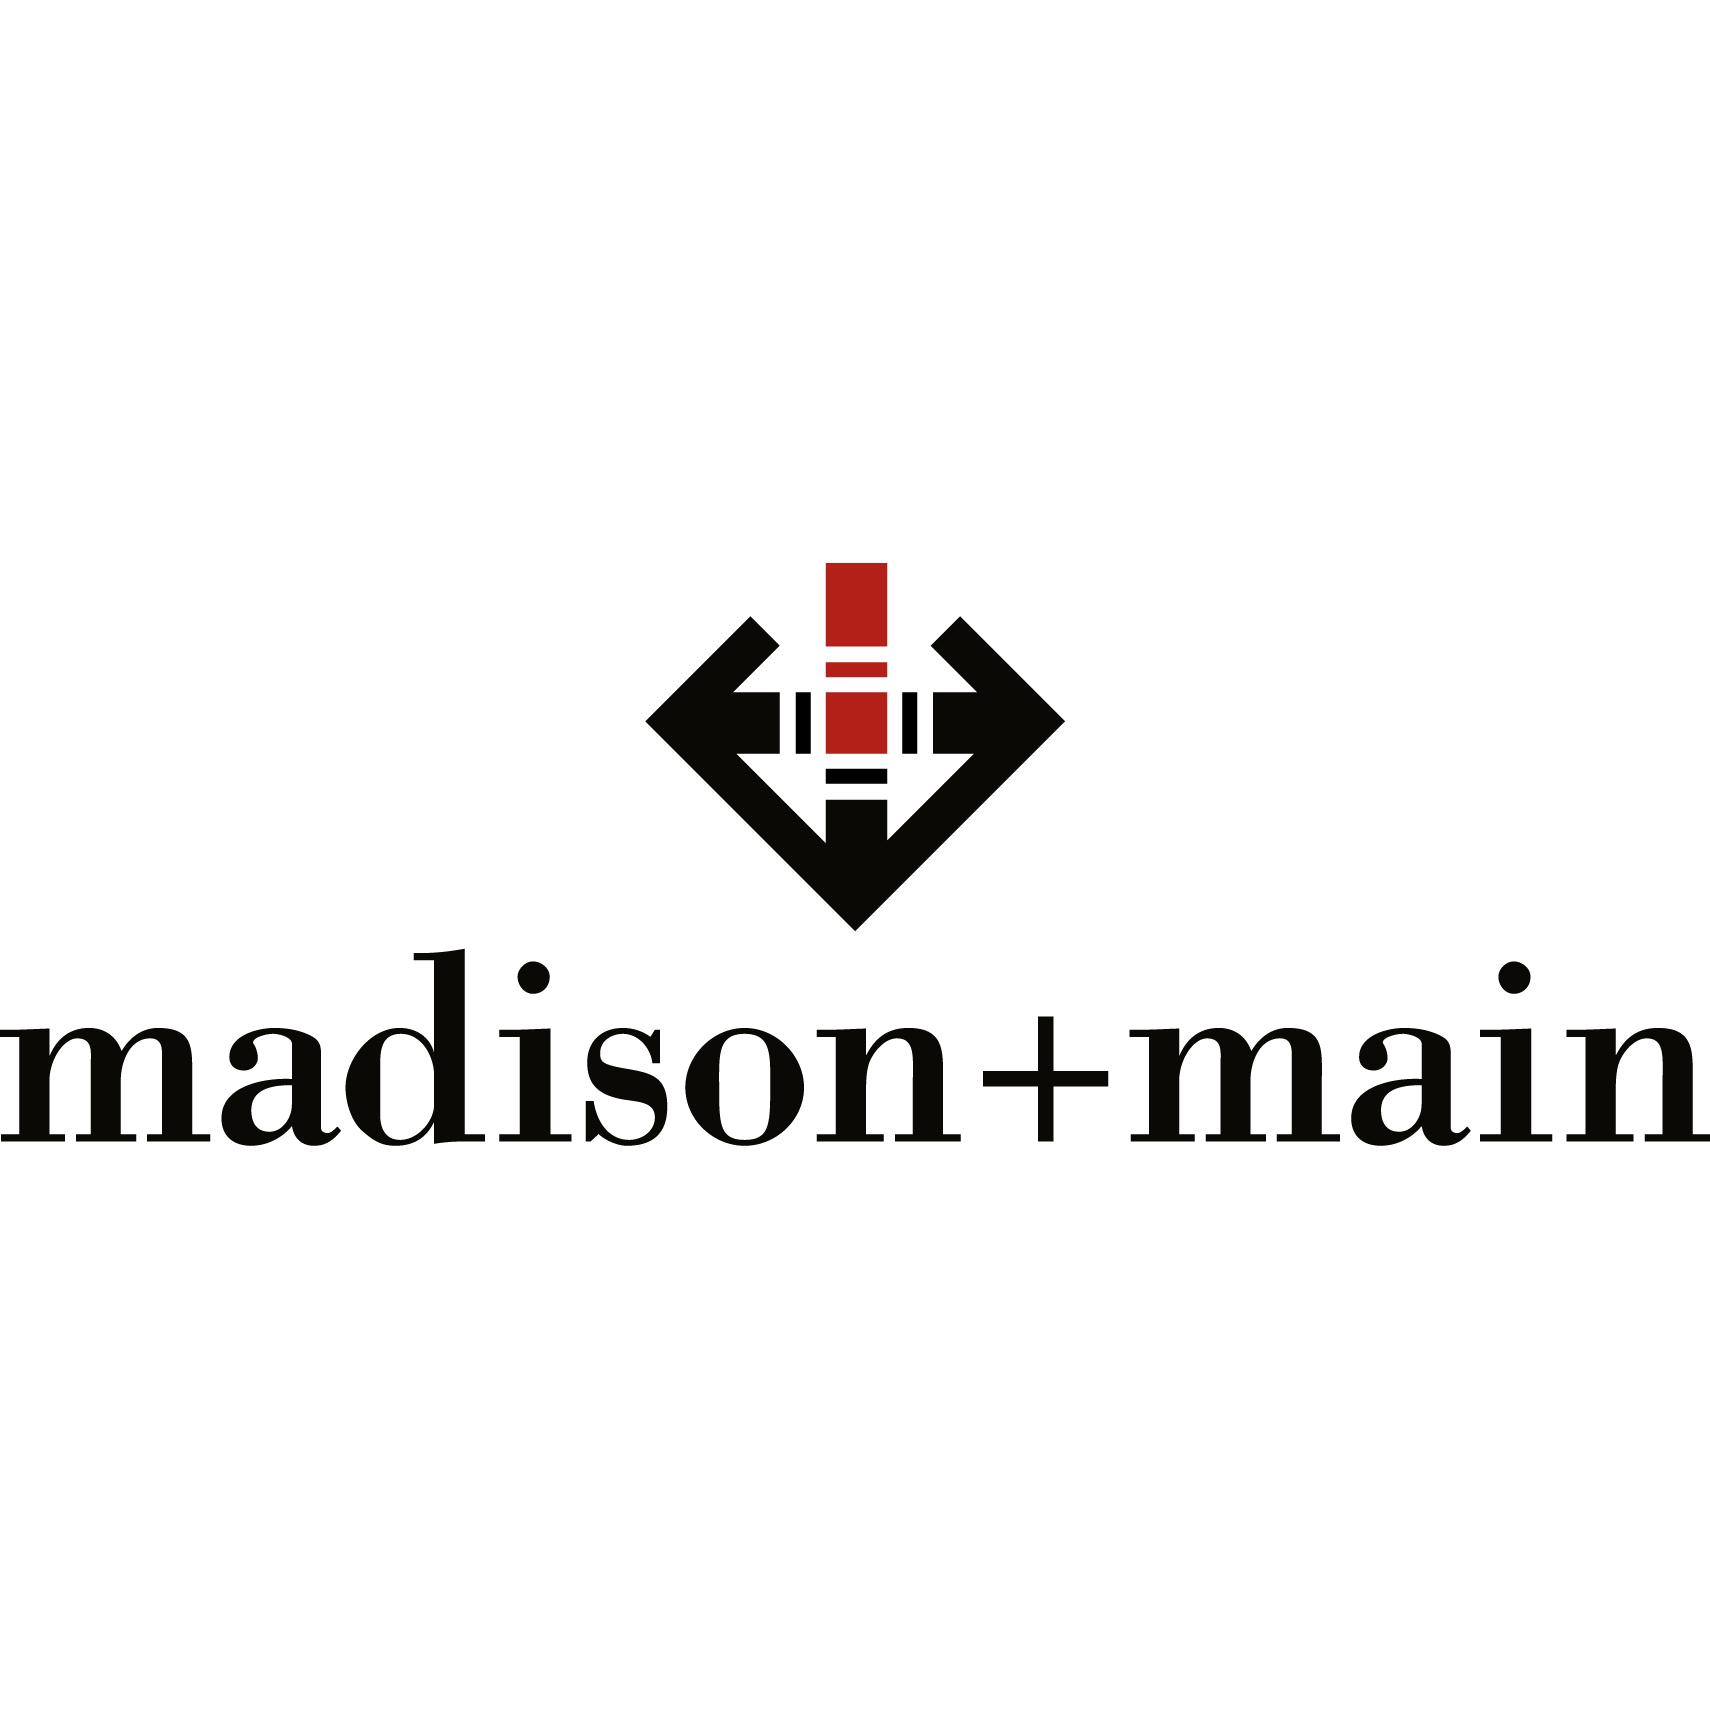 Madison+Main - Richmond, VA - Advertising Agencies & Public Relations